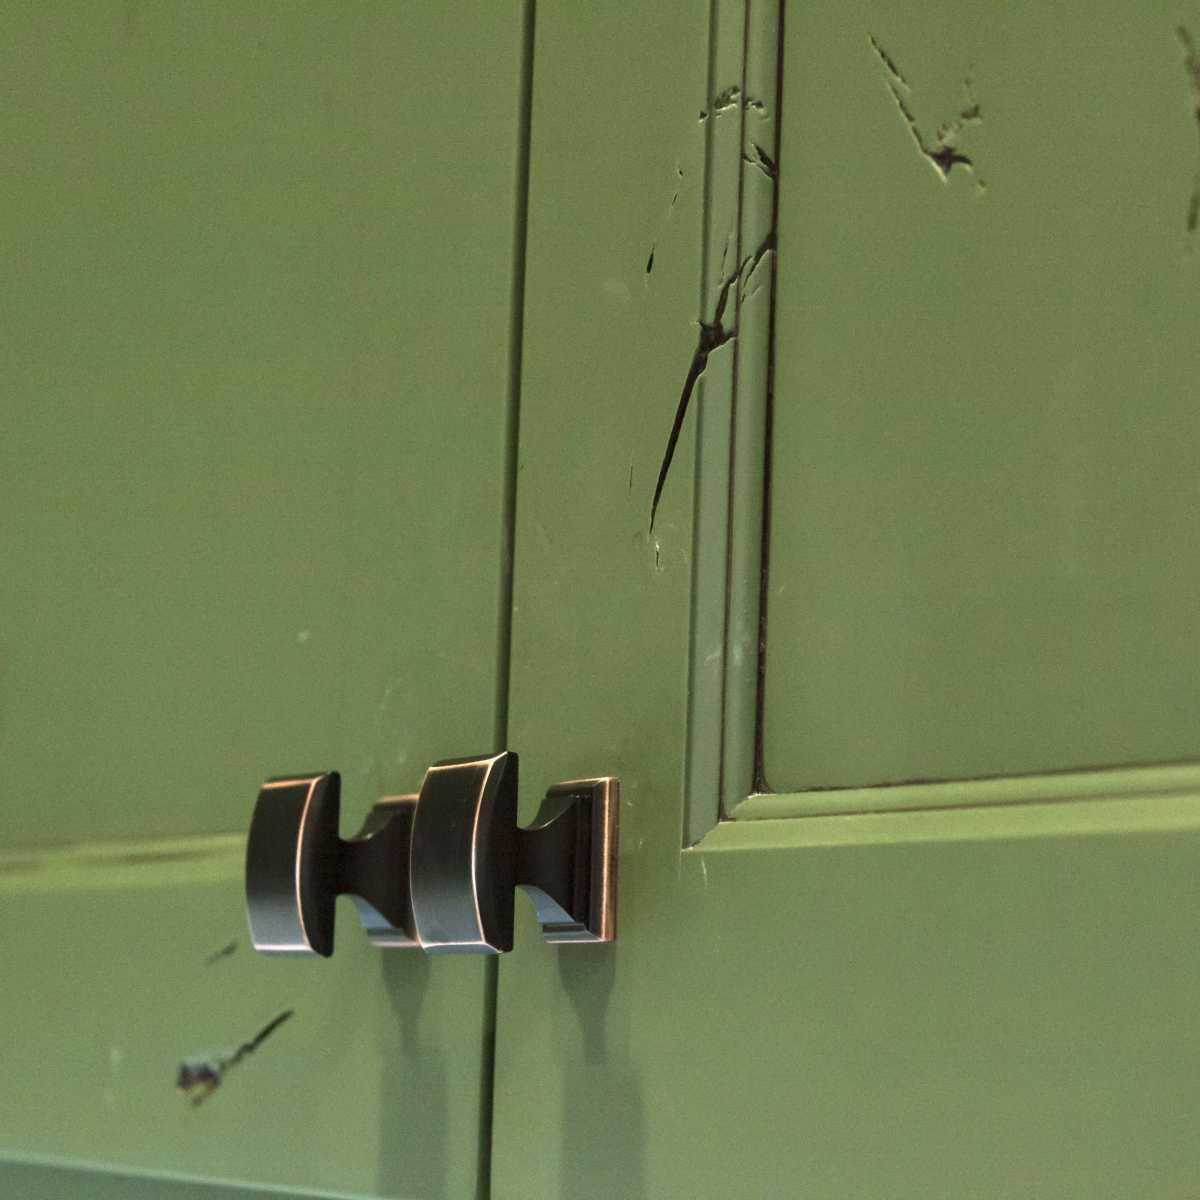 The oil-rubbed bronze cabinet hardware.